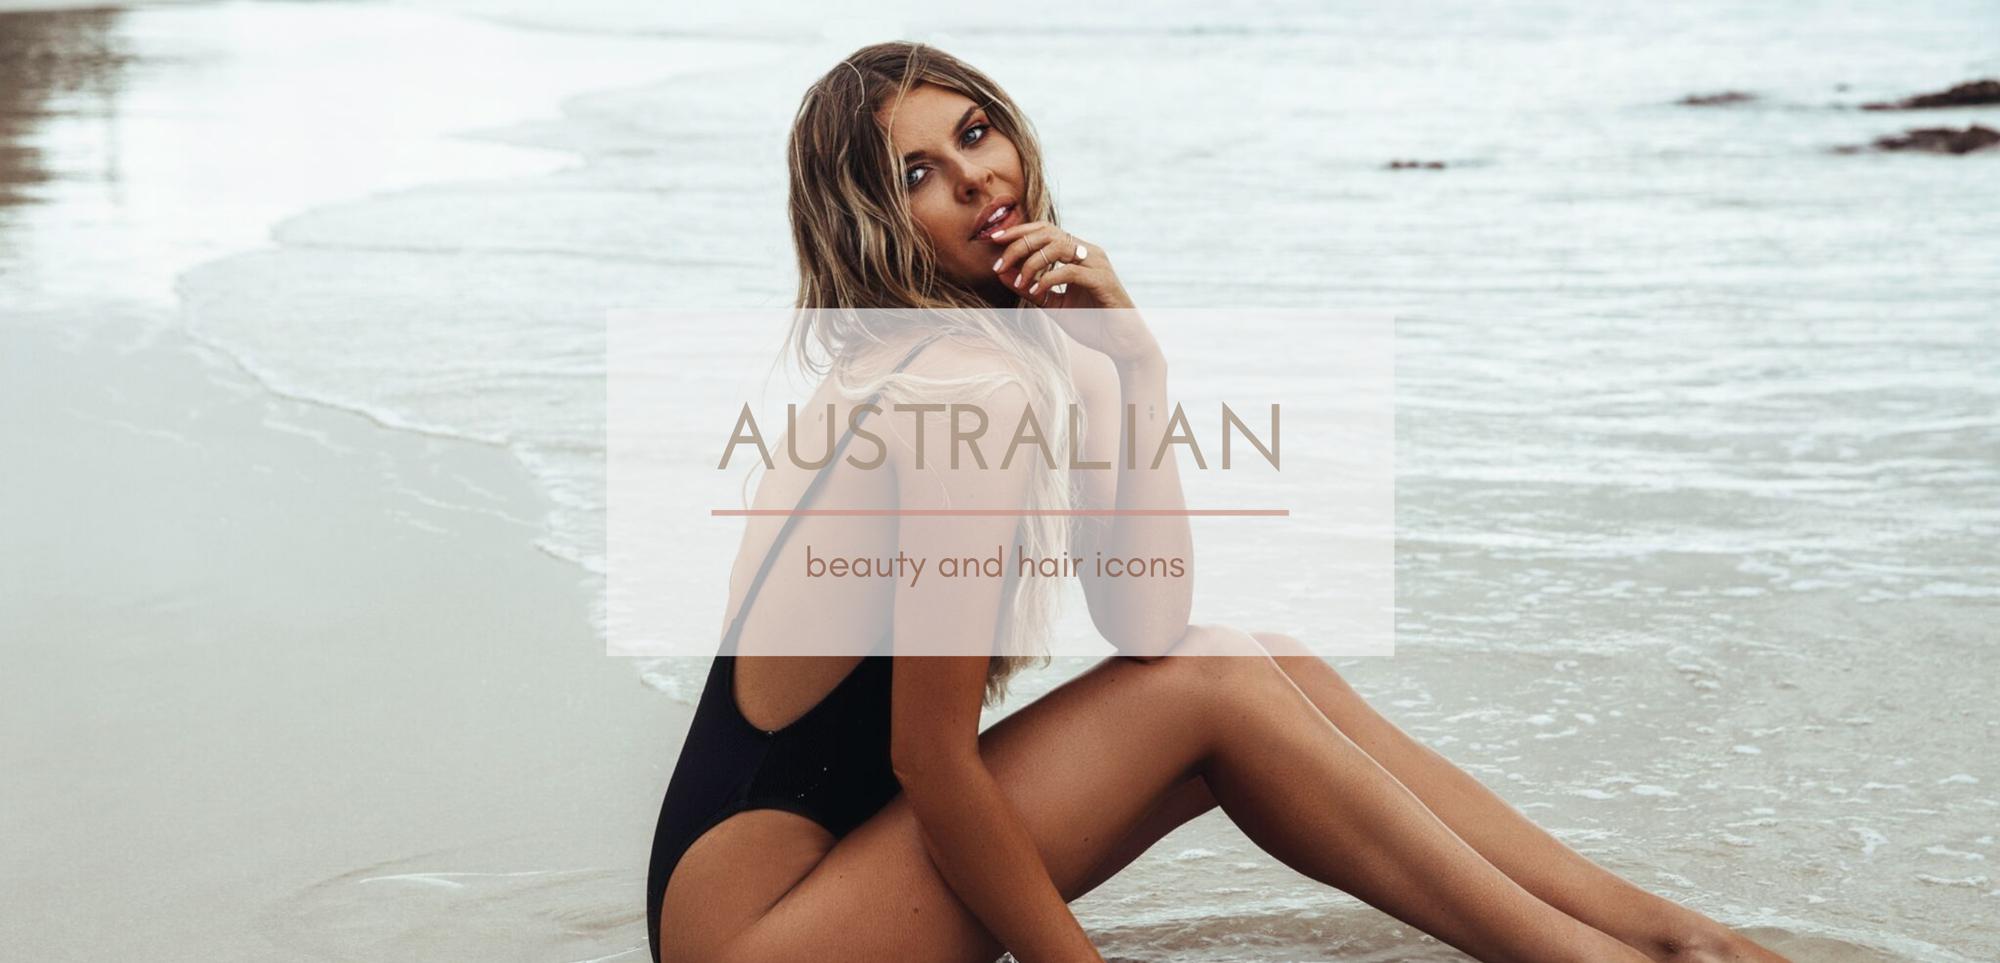 Australian Beauty and Hair Icons